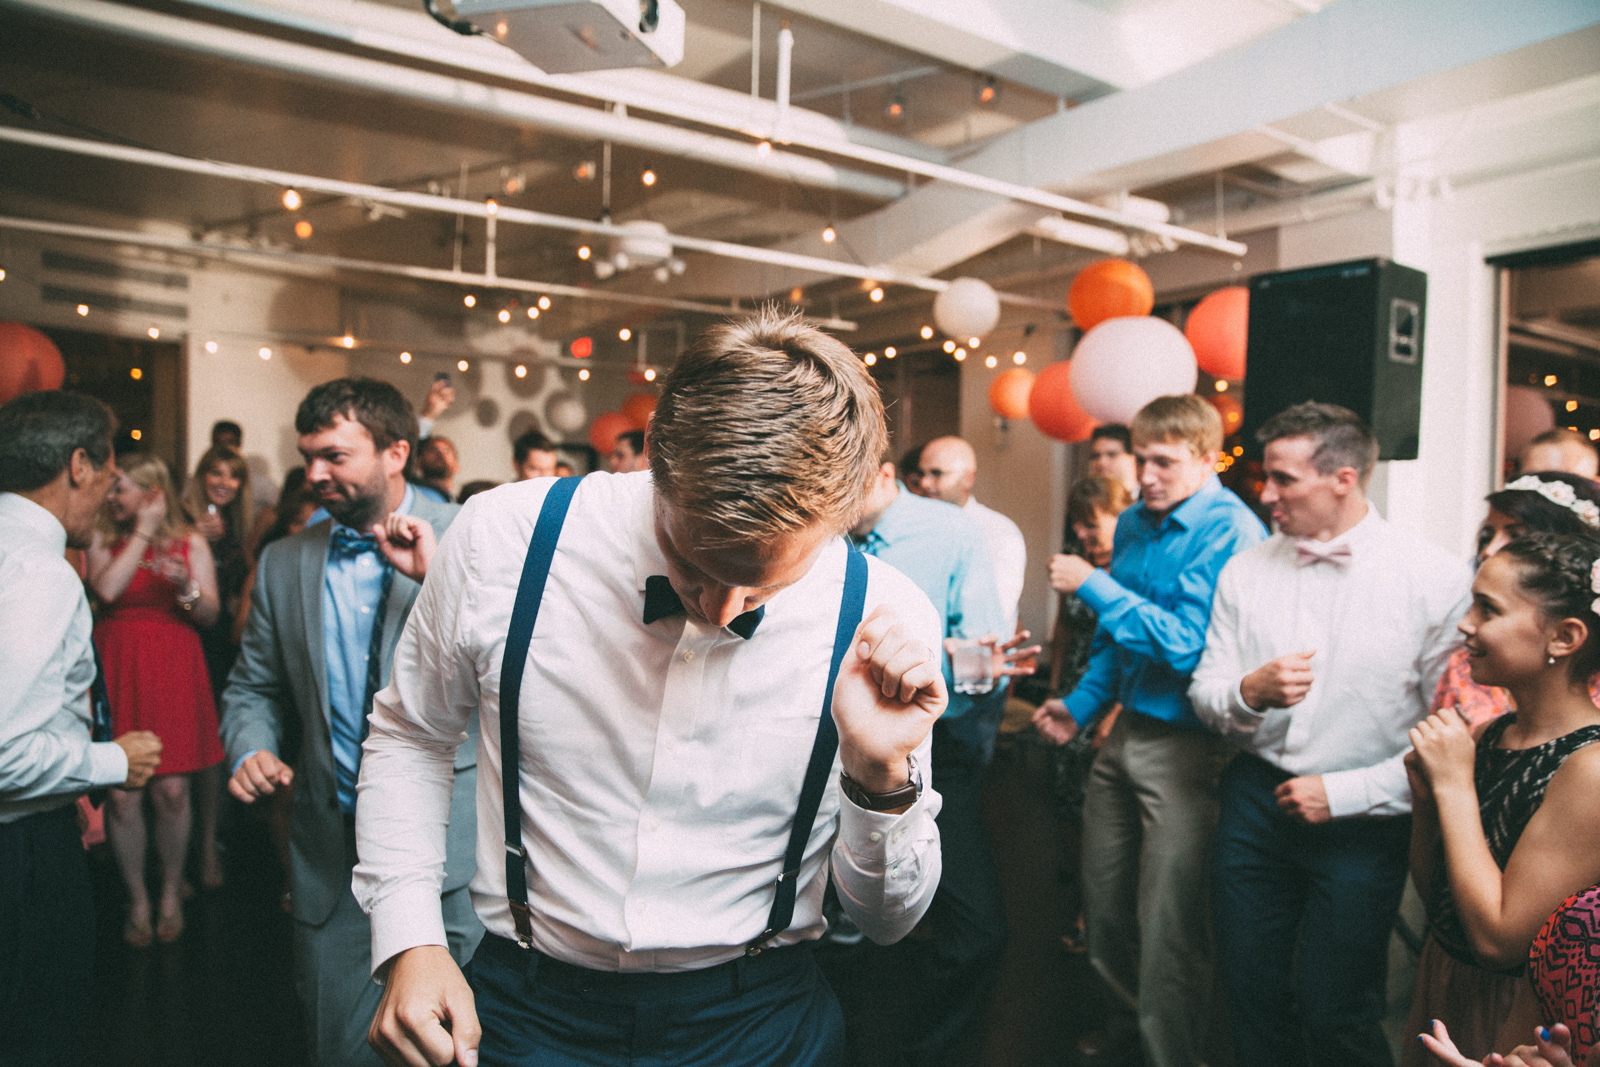 Groom dancing at his wedding reception in Kansas City